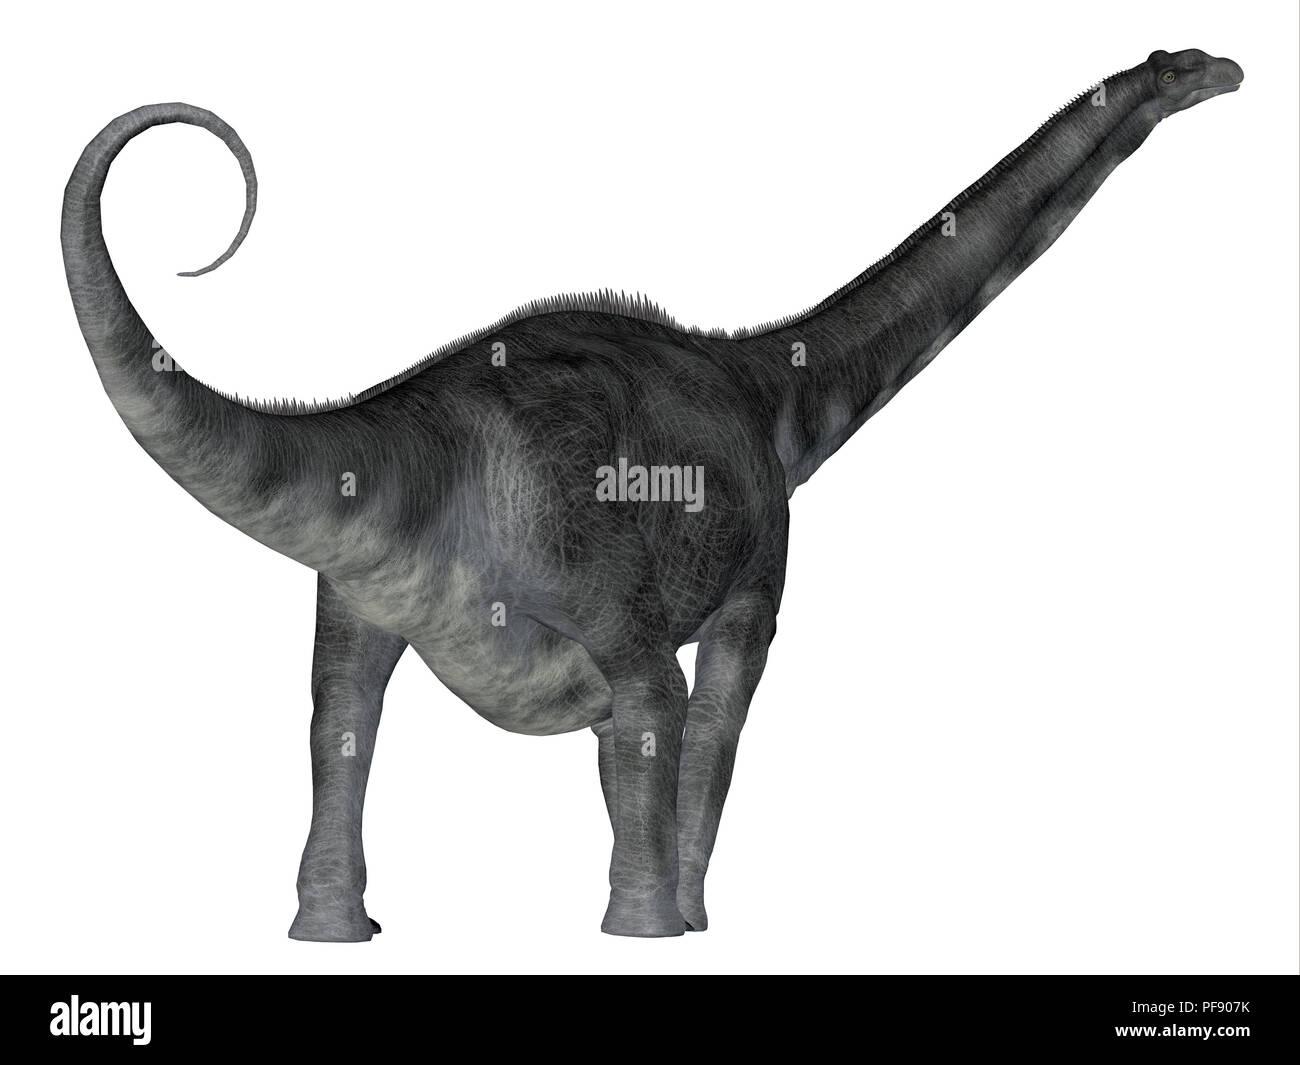 Argentinosaurus Dinosaur - Argentinosaurus was a herbivorous sauropod dinosaur that lived in Argentina during the Cretaceous Period. - Stock Image